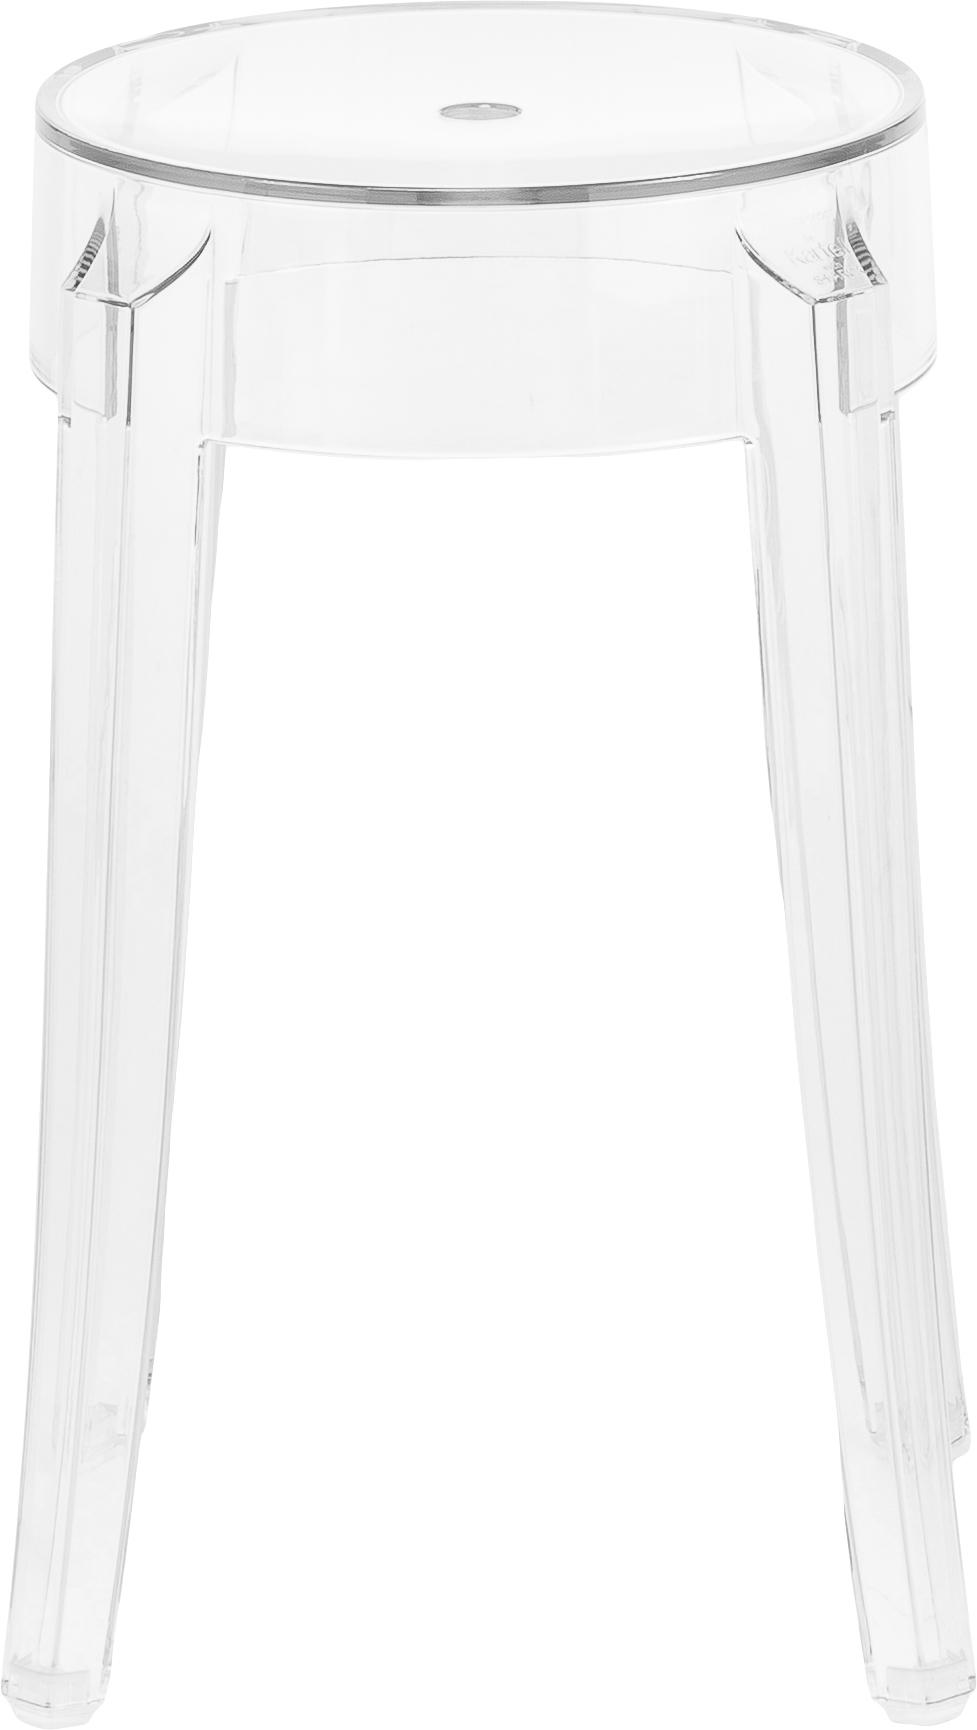 Tabouret/table d'appoint transparent Charles Ghost, Transparent